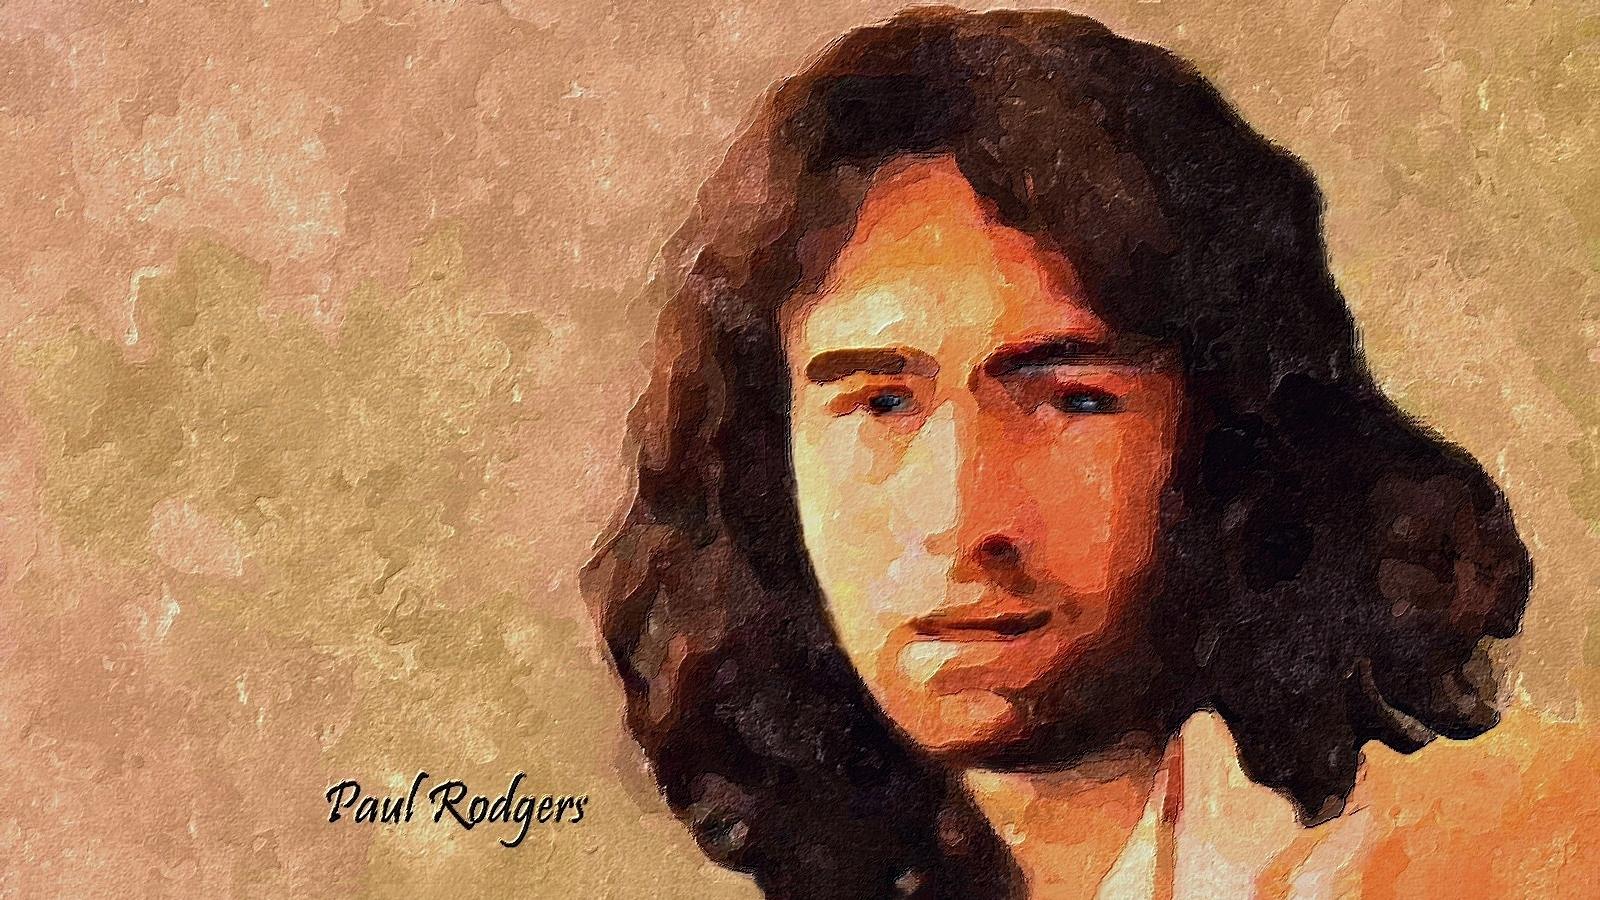 Paul Rodgers Net Worth